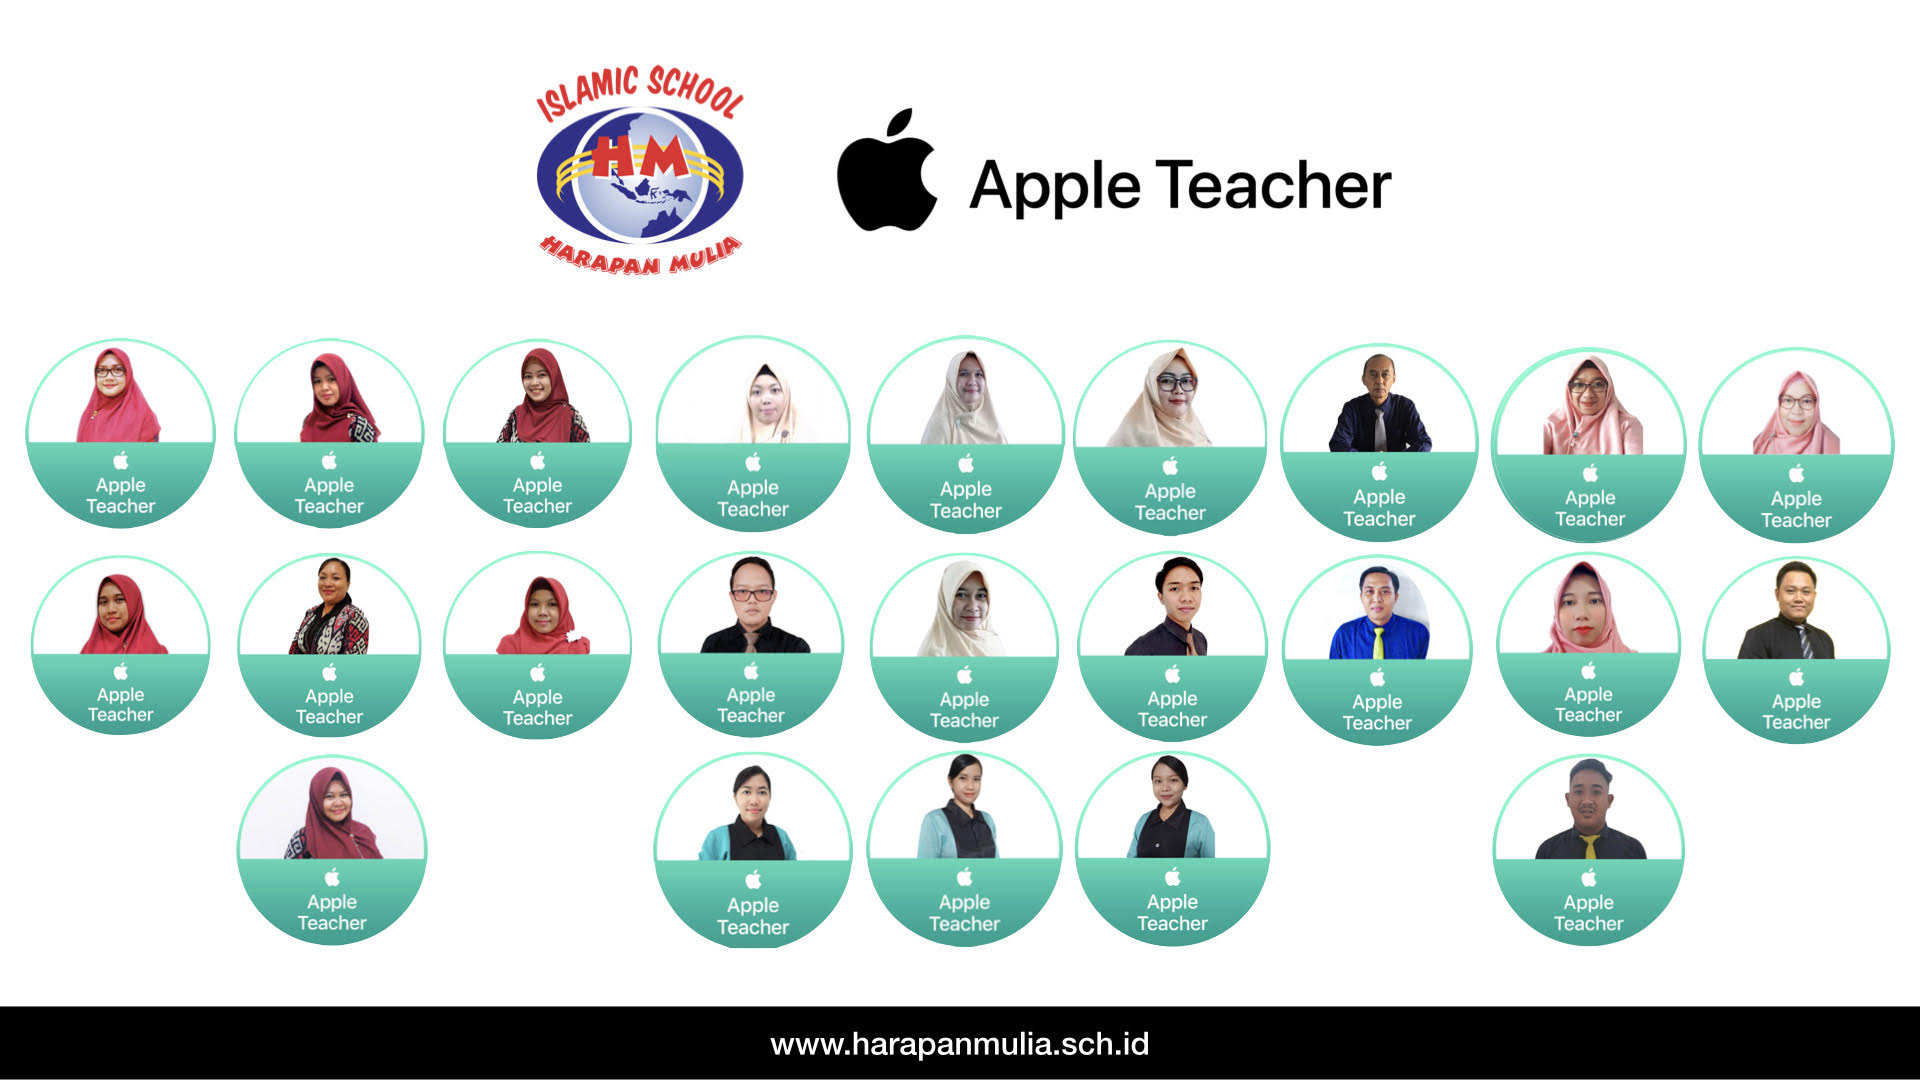 Apple teacher 2021 Islamic School Harapan mulia